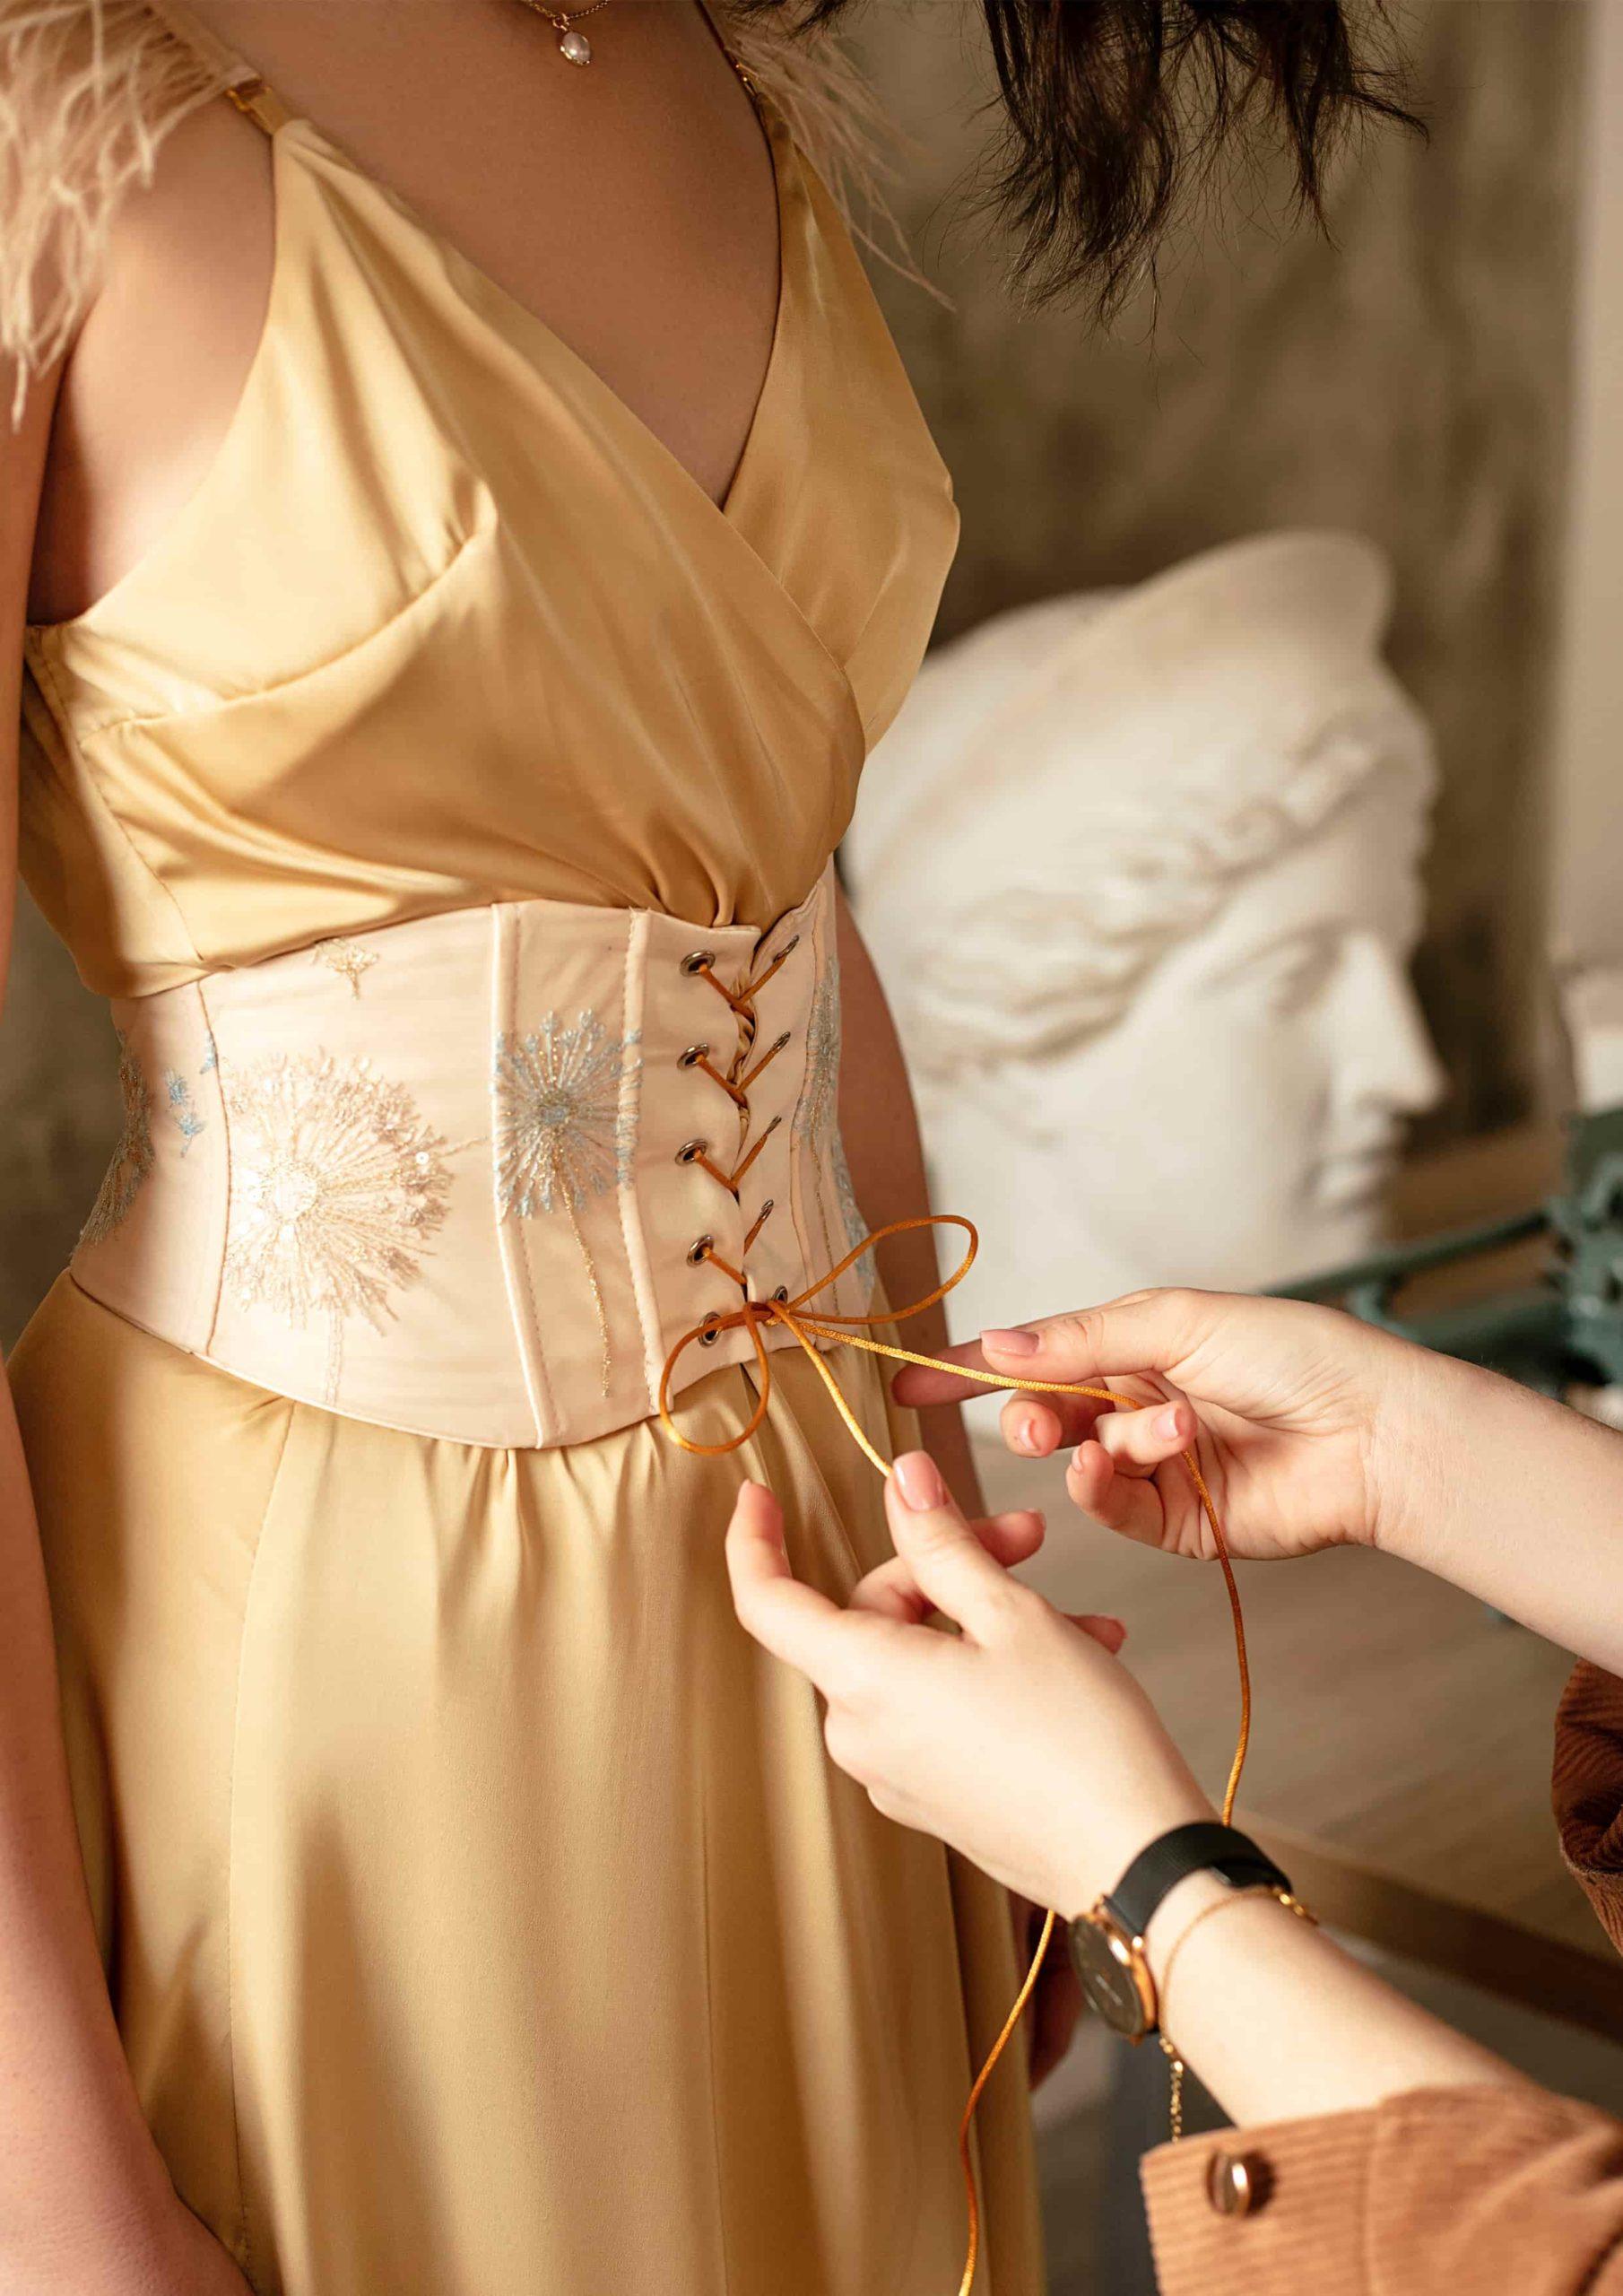 Golden Hour Dress elegant fashion style your musa la musa model 2020 2021